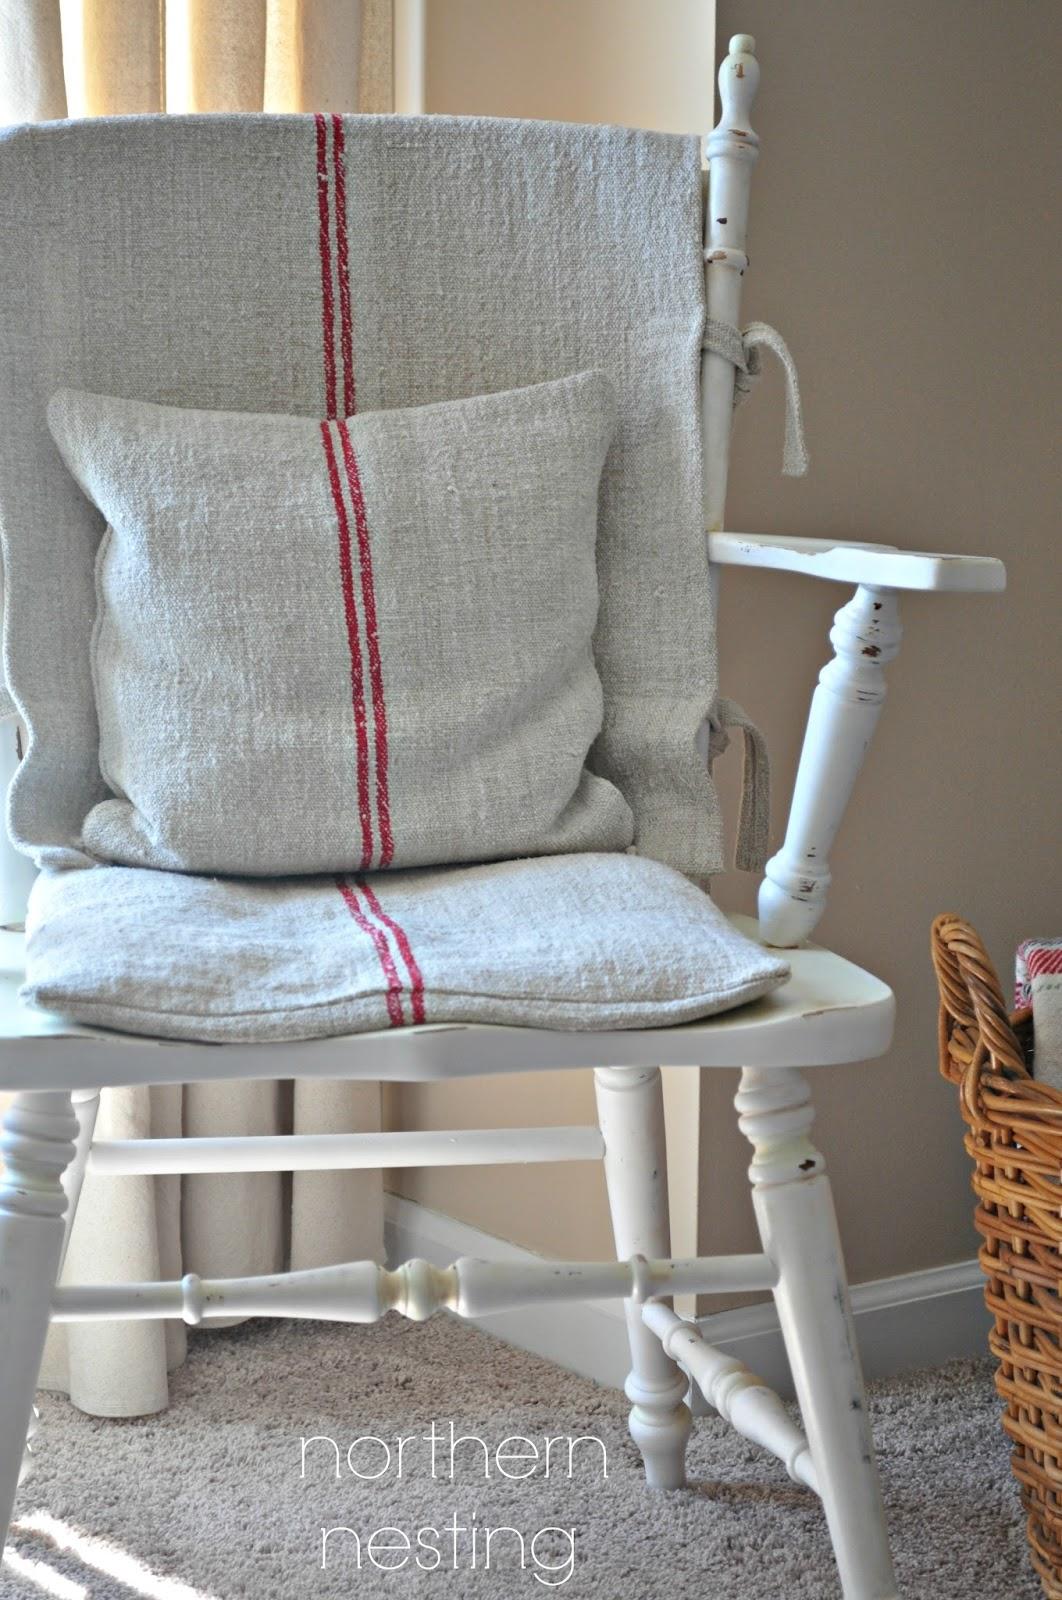 Northern Nesting Grain Sack Cushions By Ann